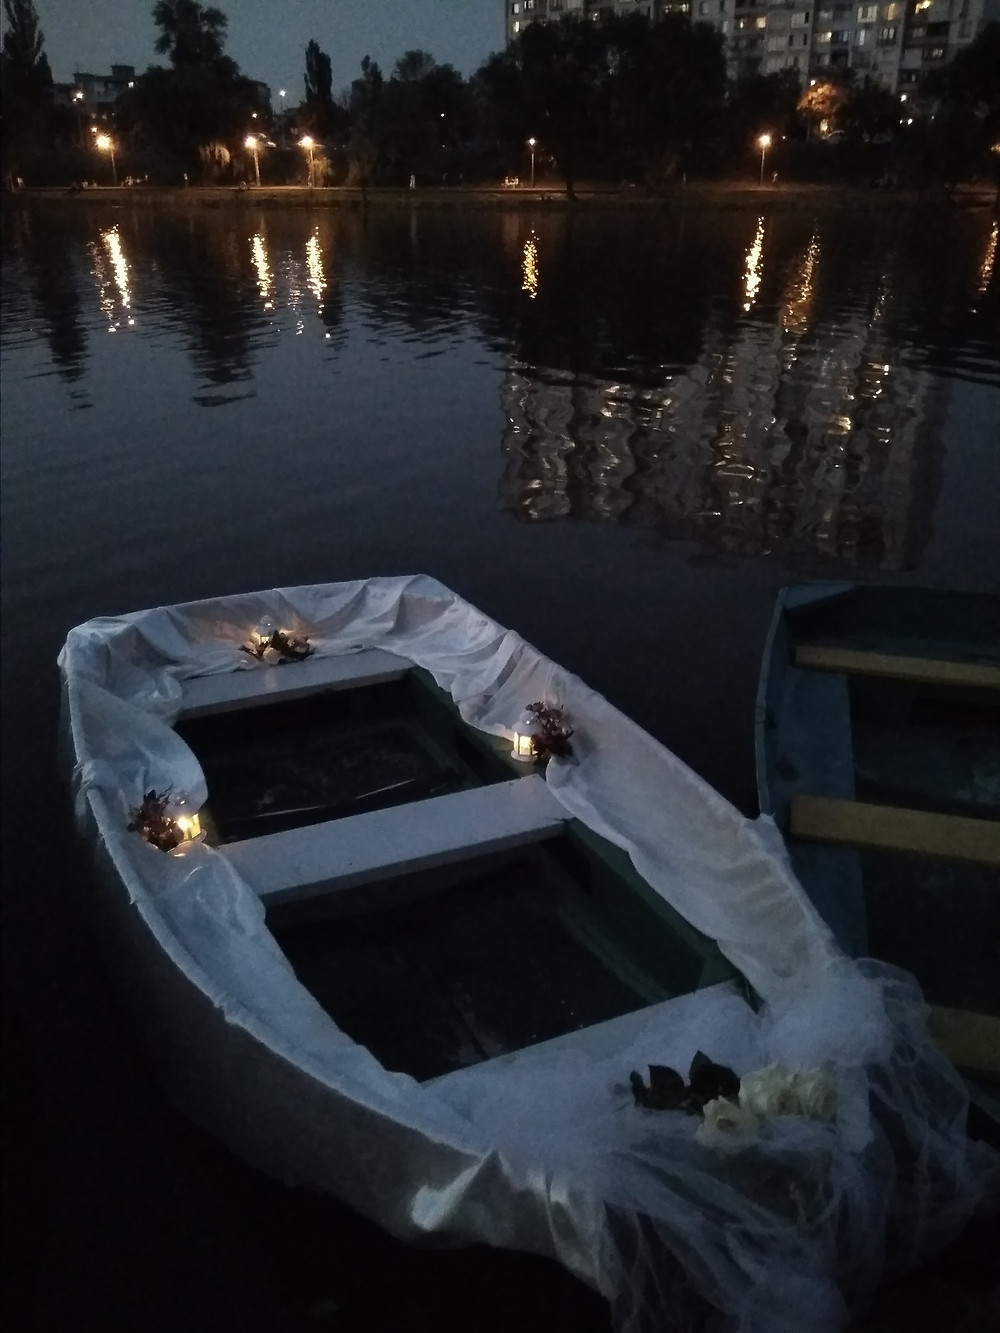 Альтечо, Романтический ужин на плоту посреди озера 10